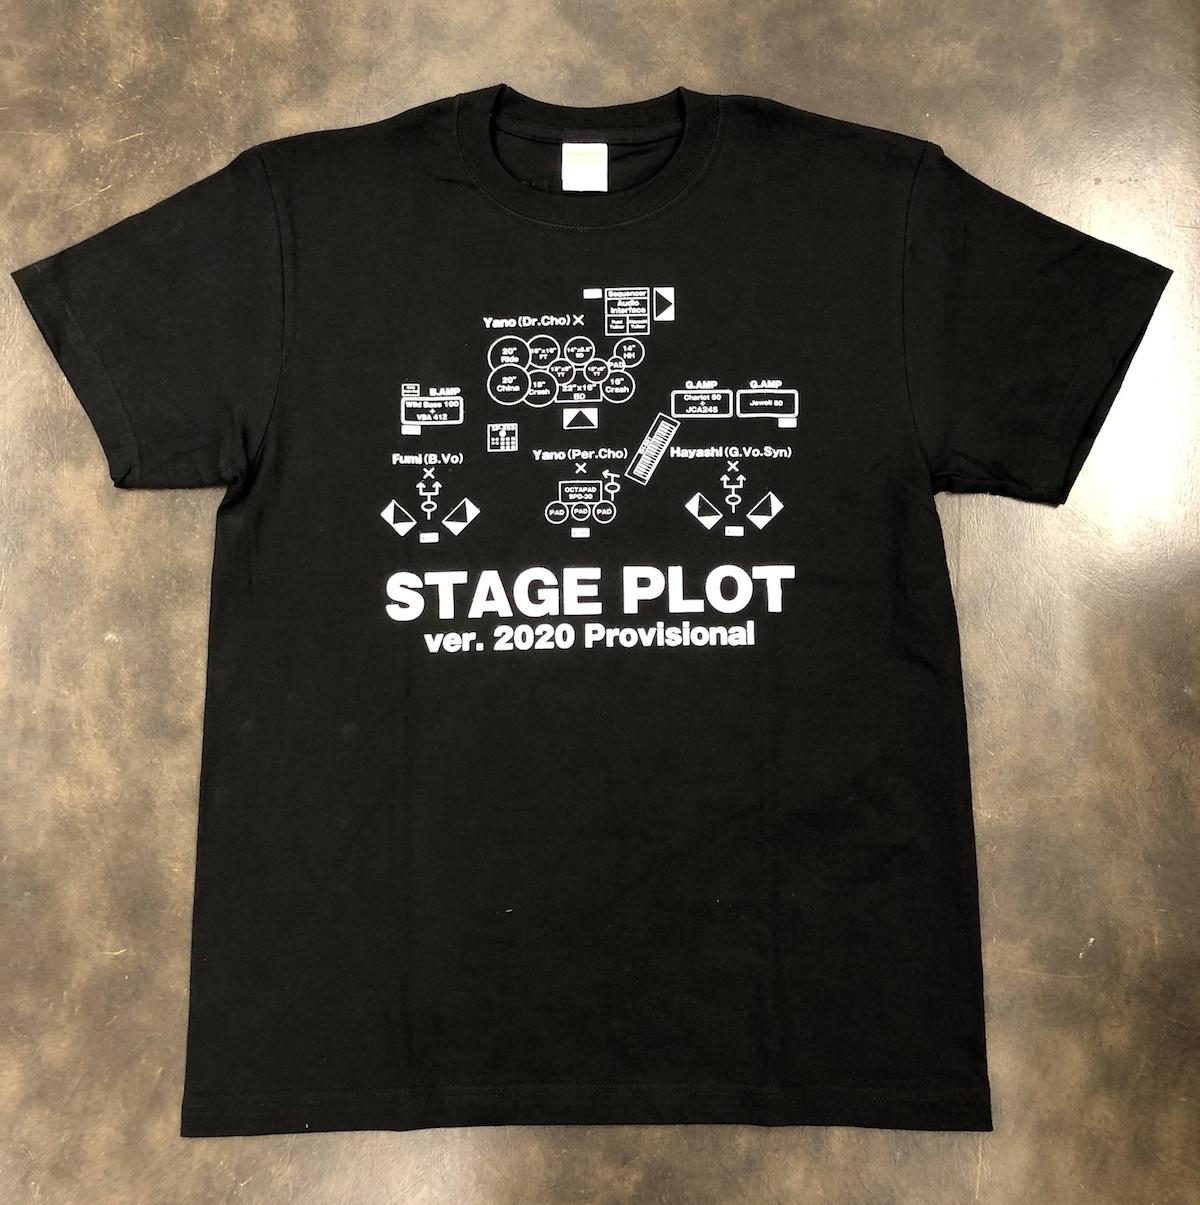 STAGE PLOT Tシャツ(ブラック)